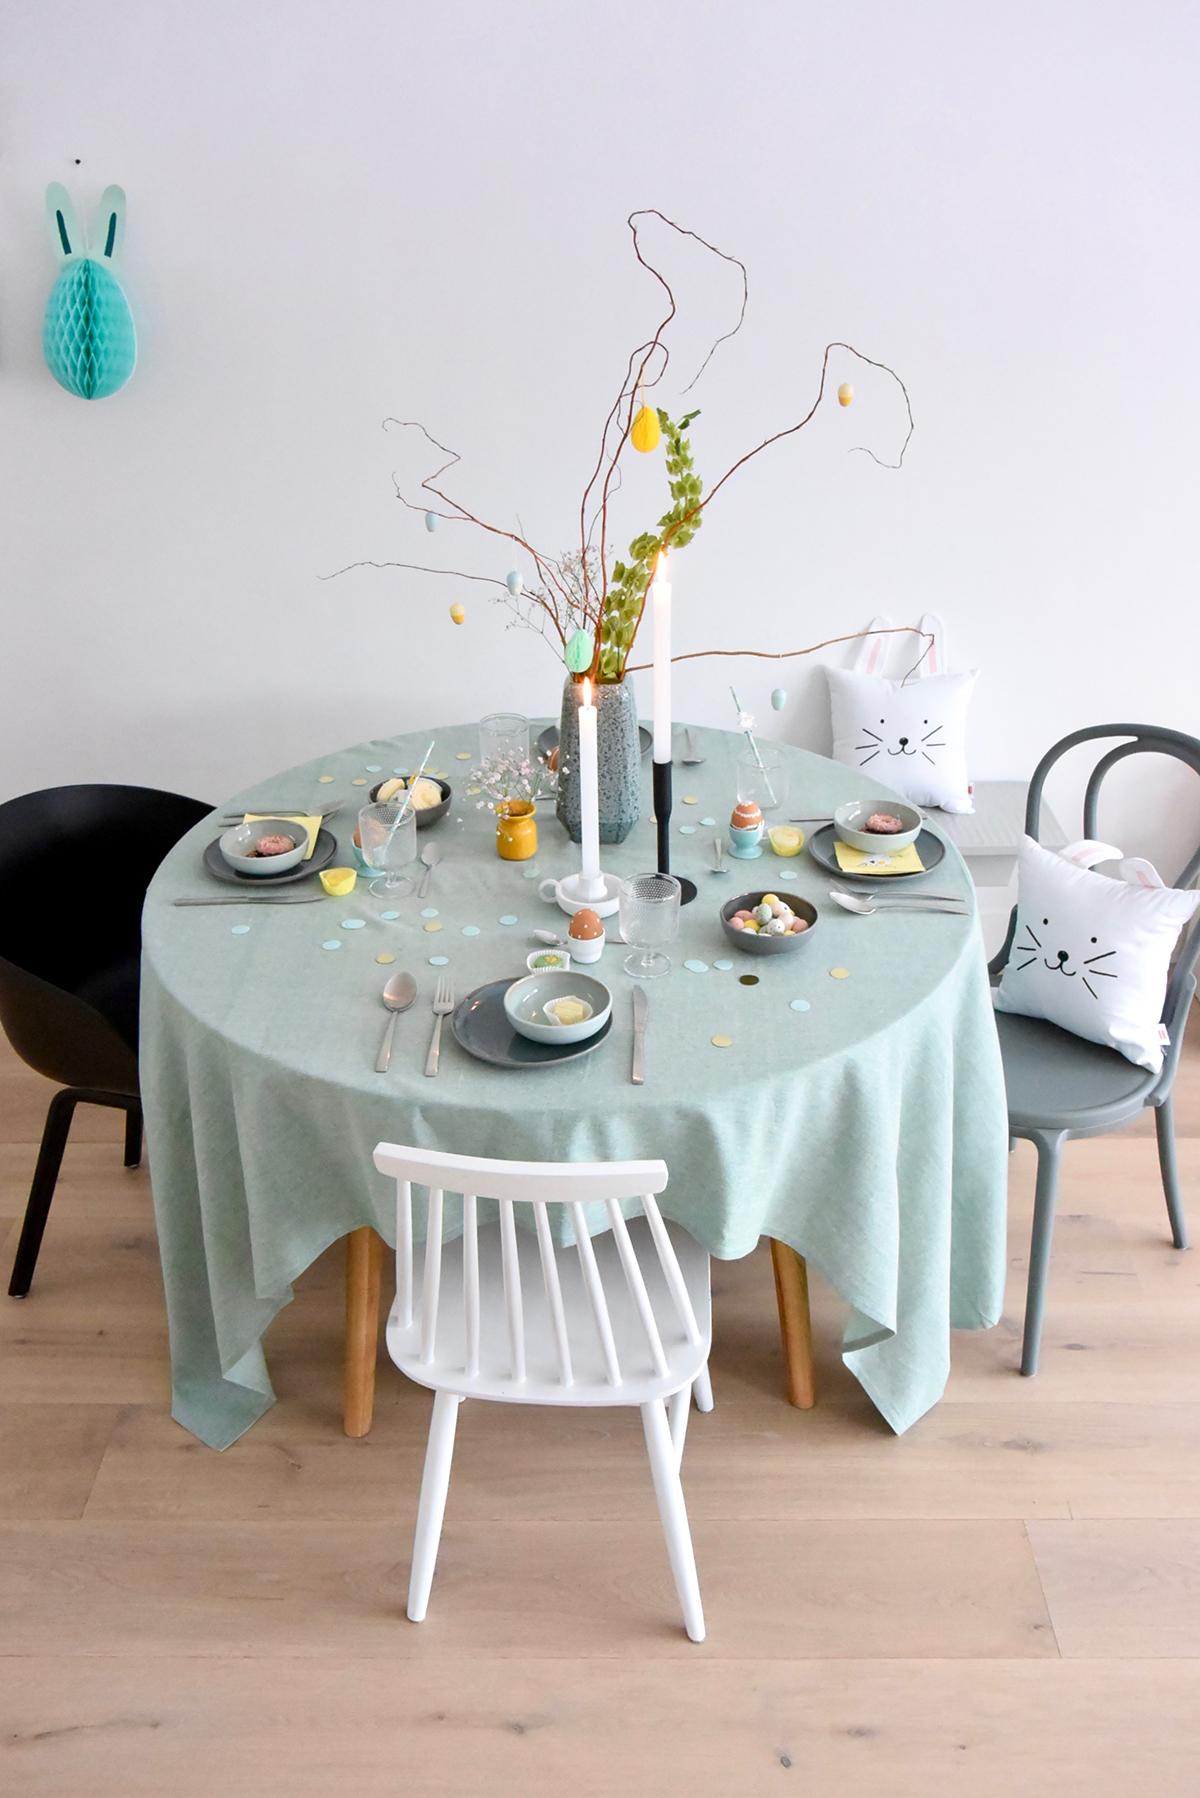 Hema-paastafel-gedekt-rond-lichtgroen-tafellaken-grijze-bordjes-groene-kommetjes